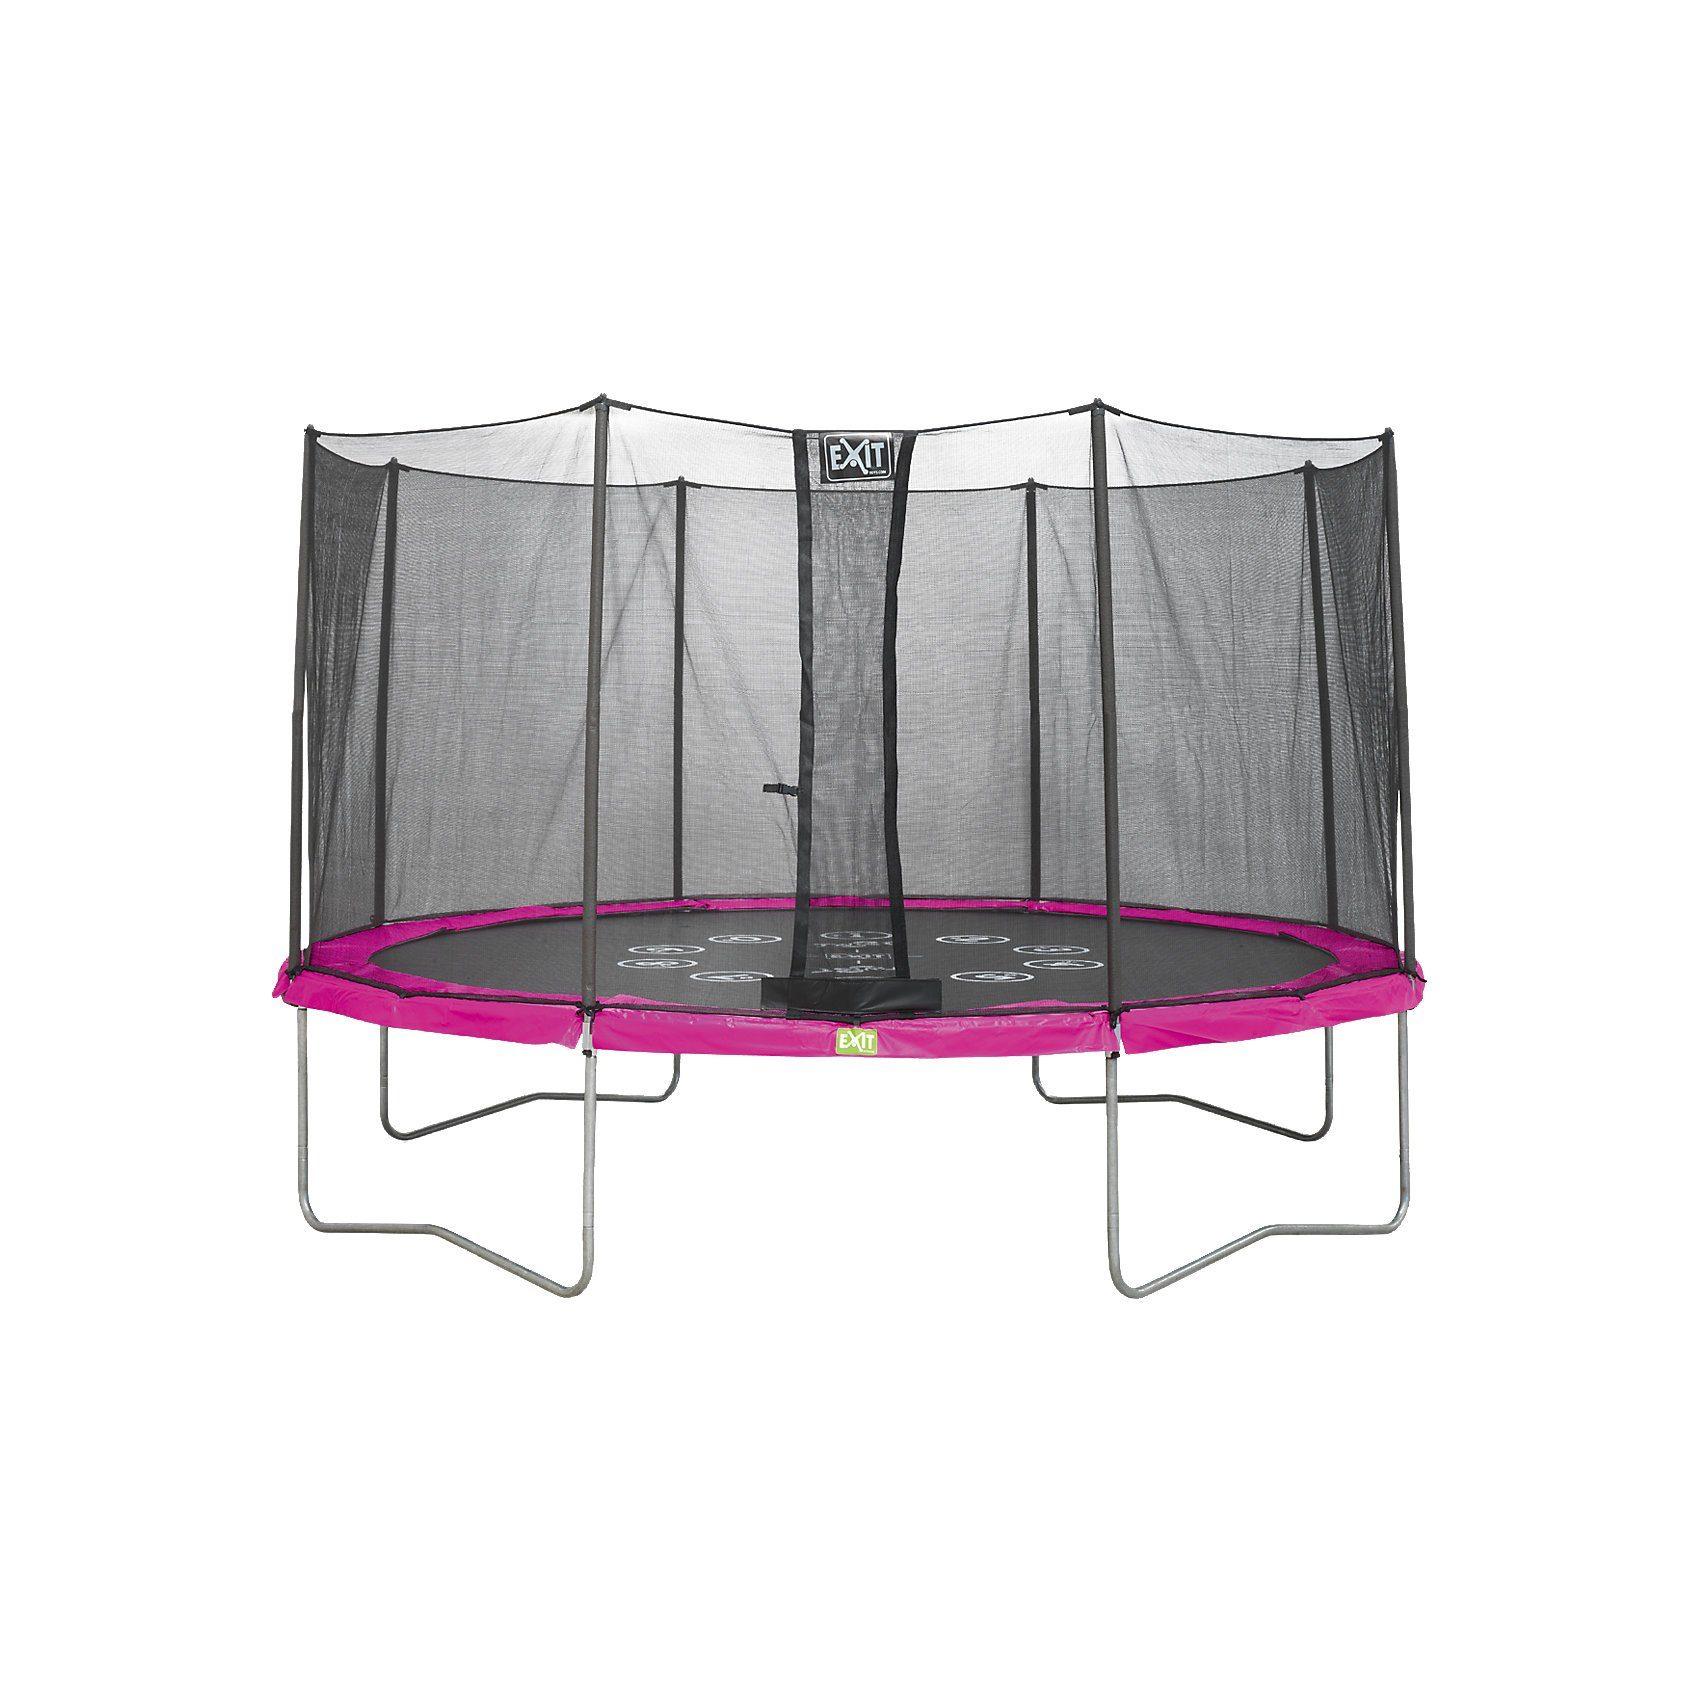 EXIT Twist Trampolin pink/grau, 366 cm